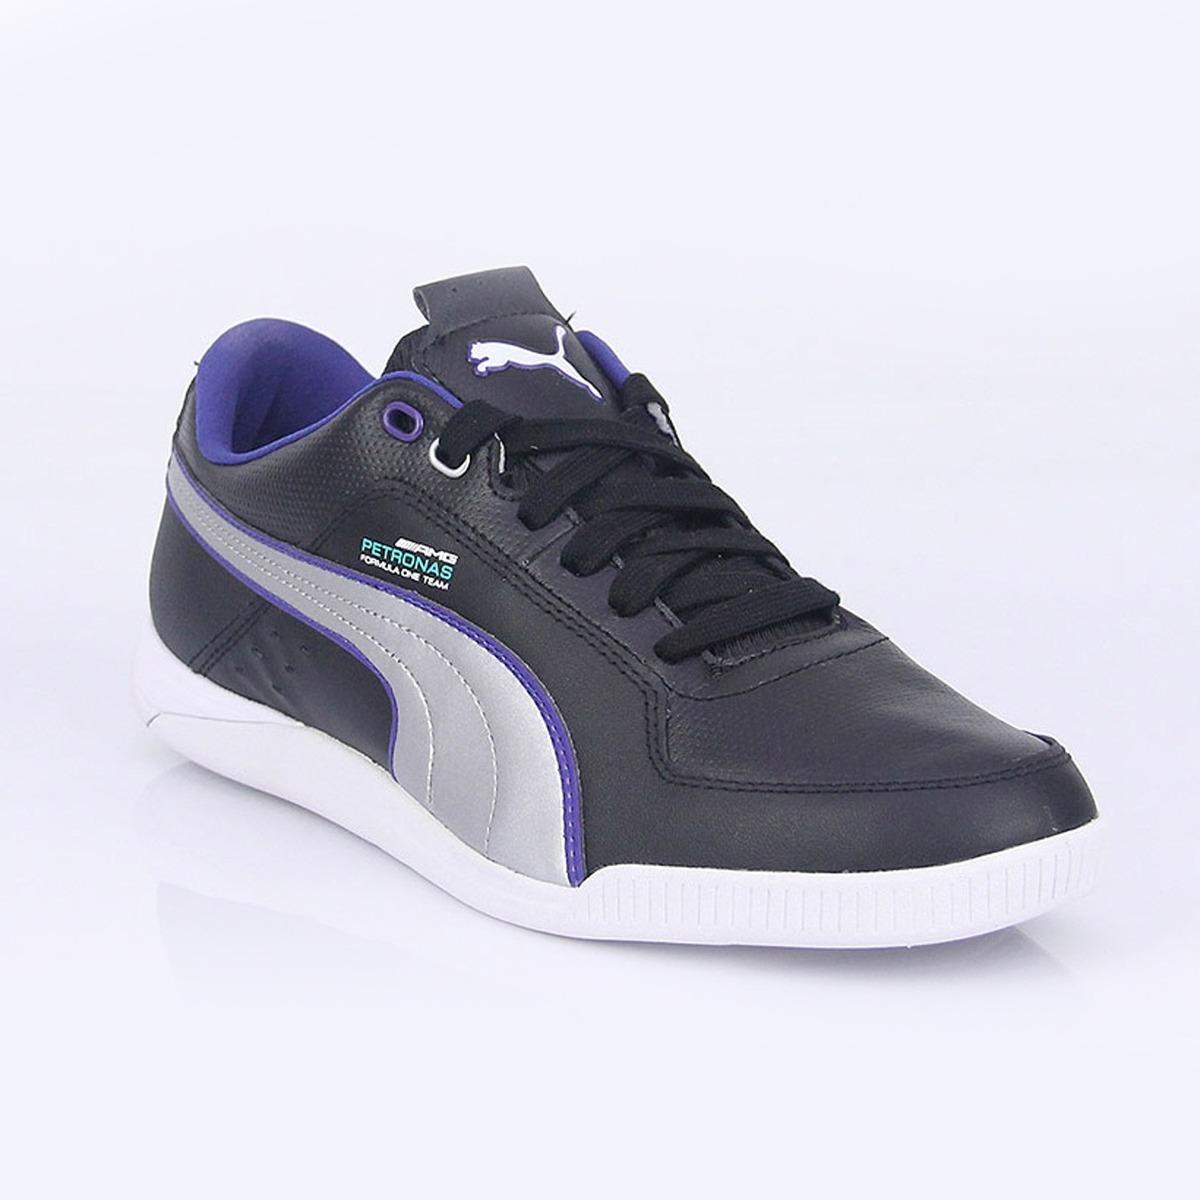 Tenis mercedes benz amg mamgp silver trainers 02 puma for Puma mercedes benz